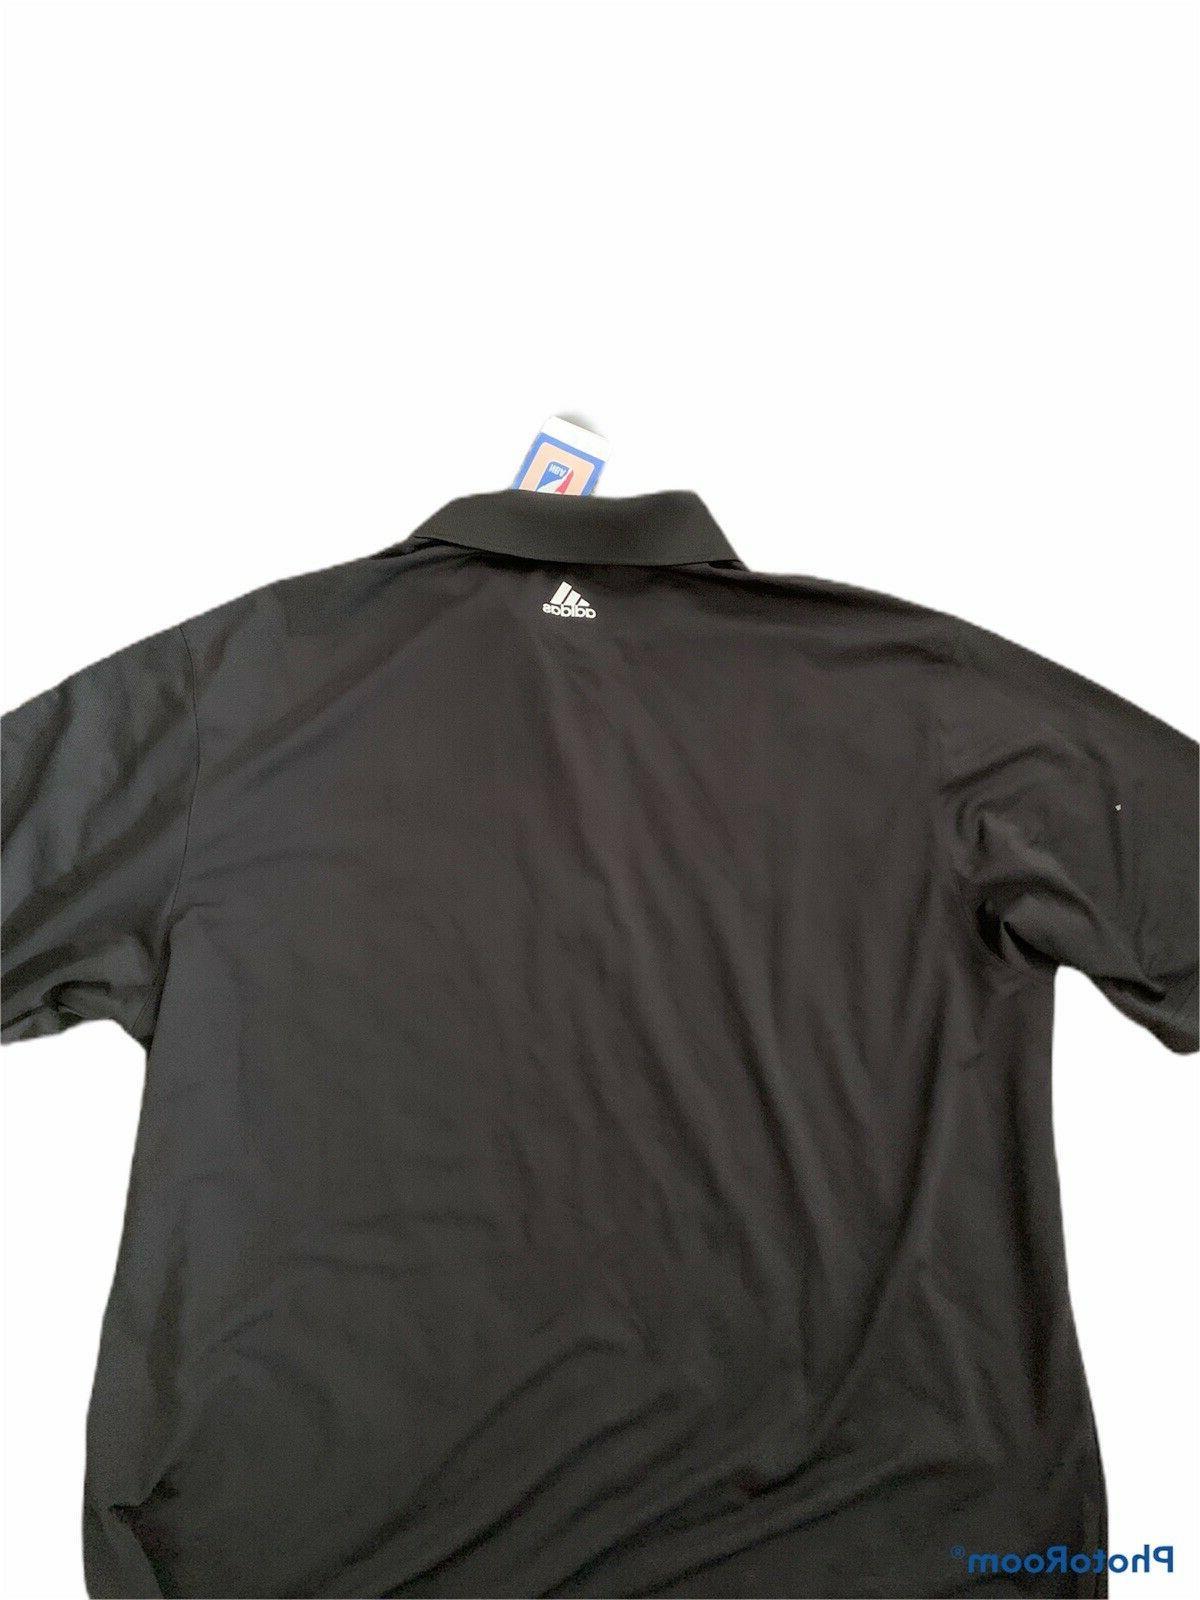 NBA Mens Large Black Shirt